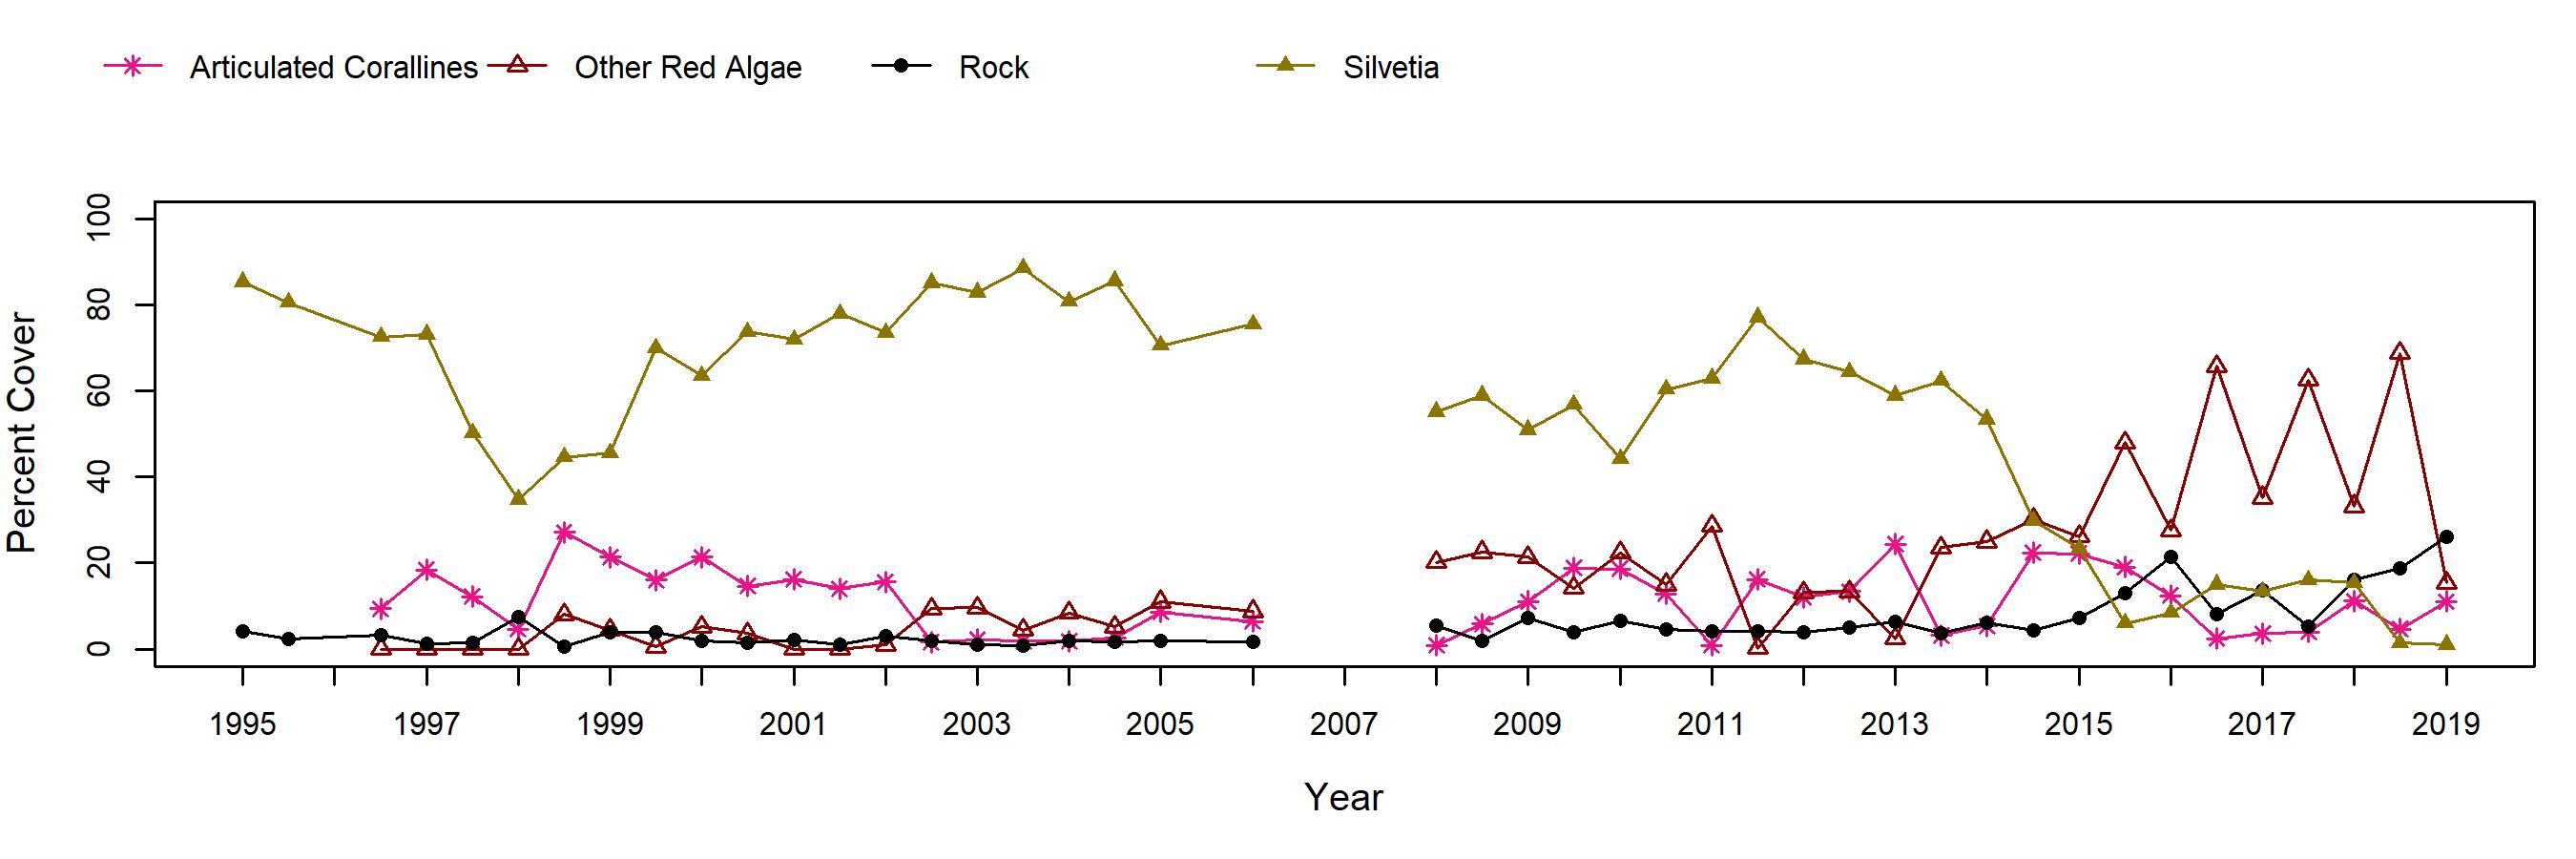 Navy North Silvetia trend plot